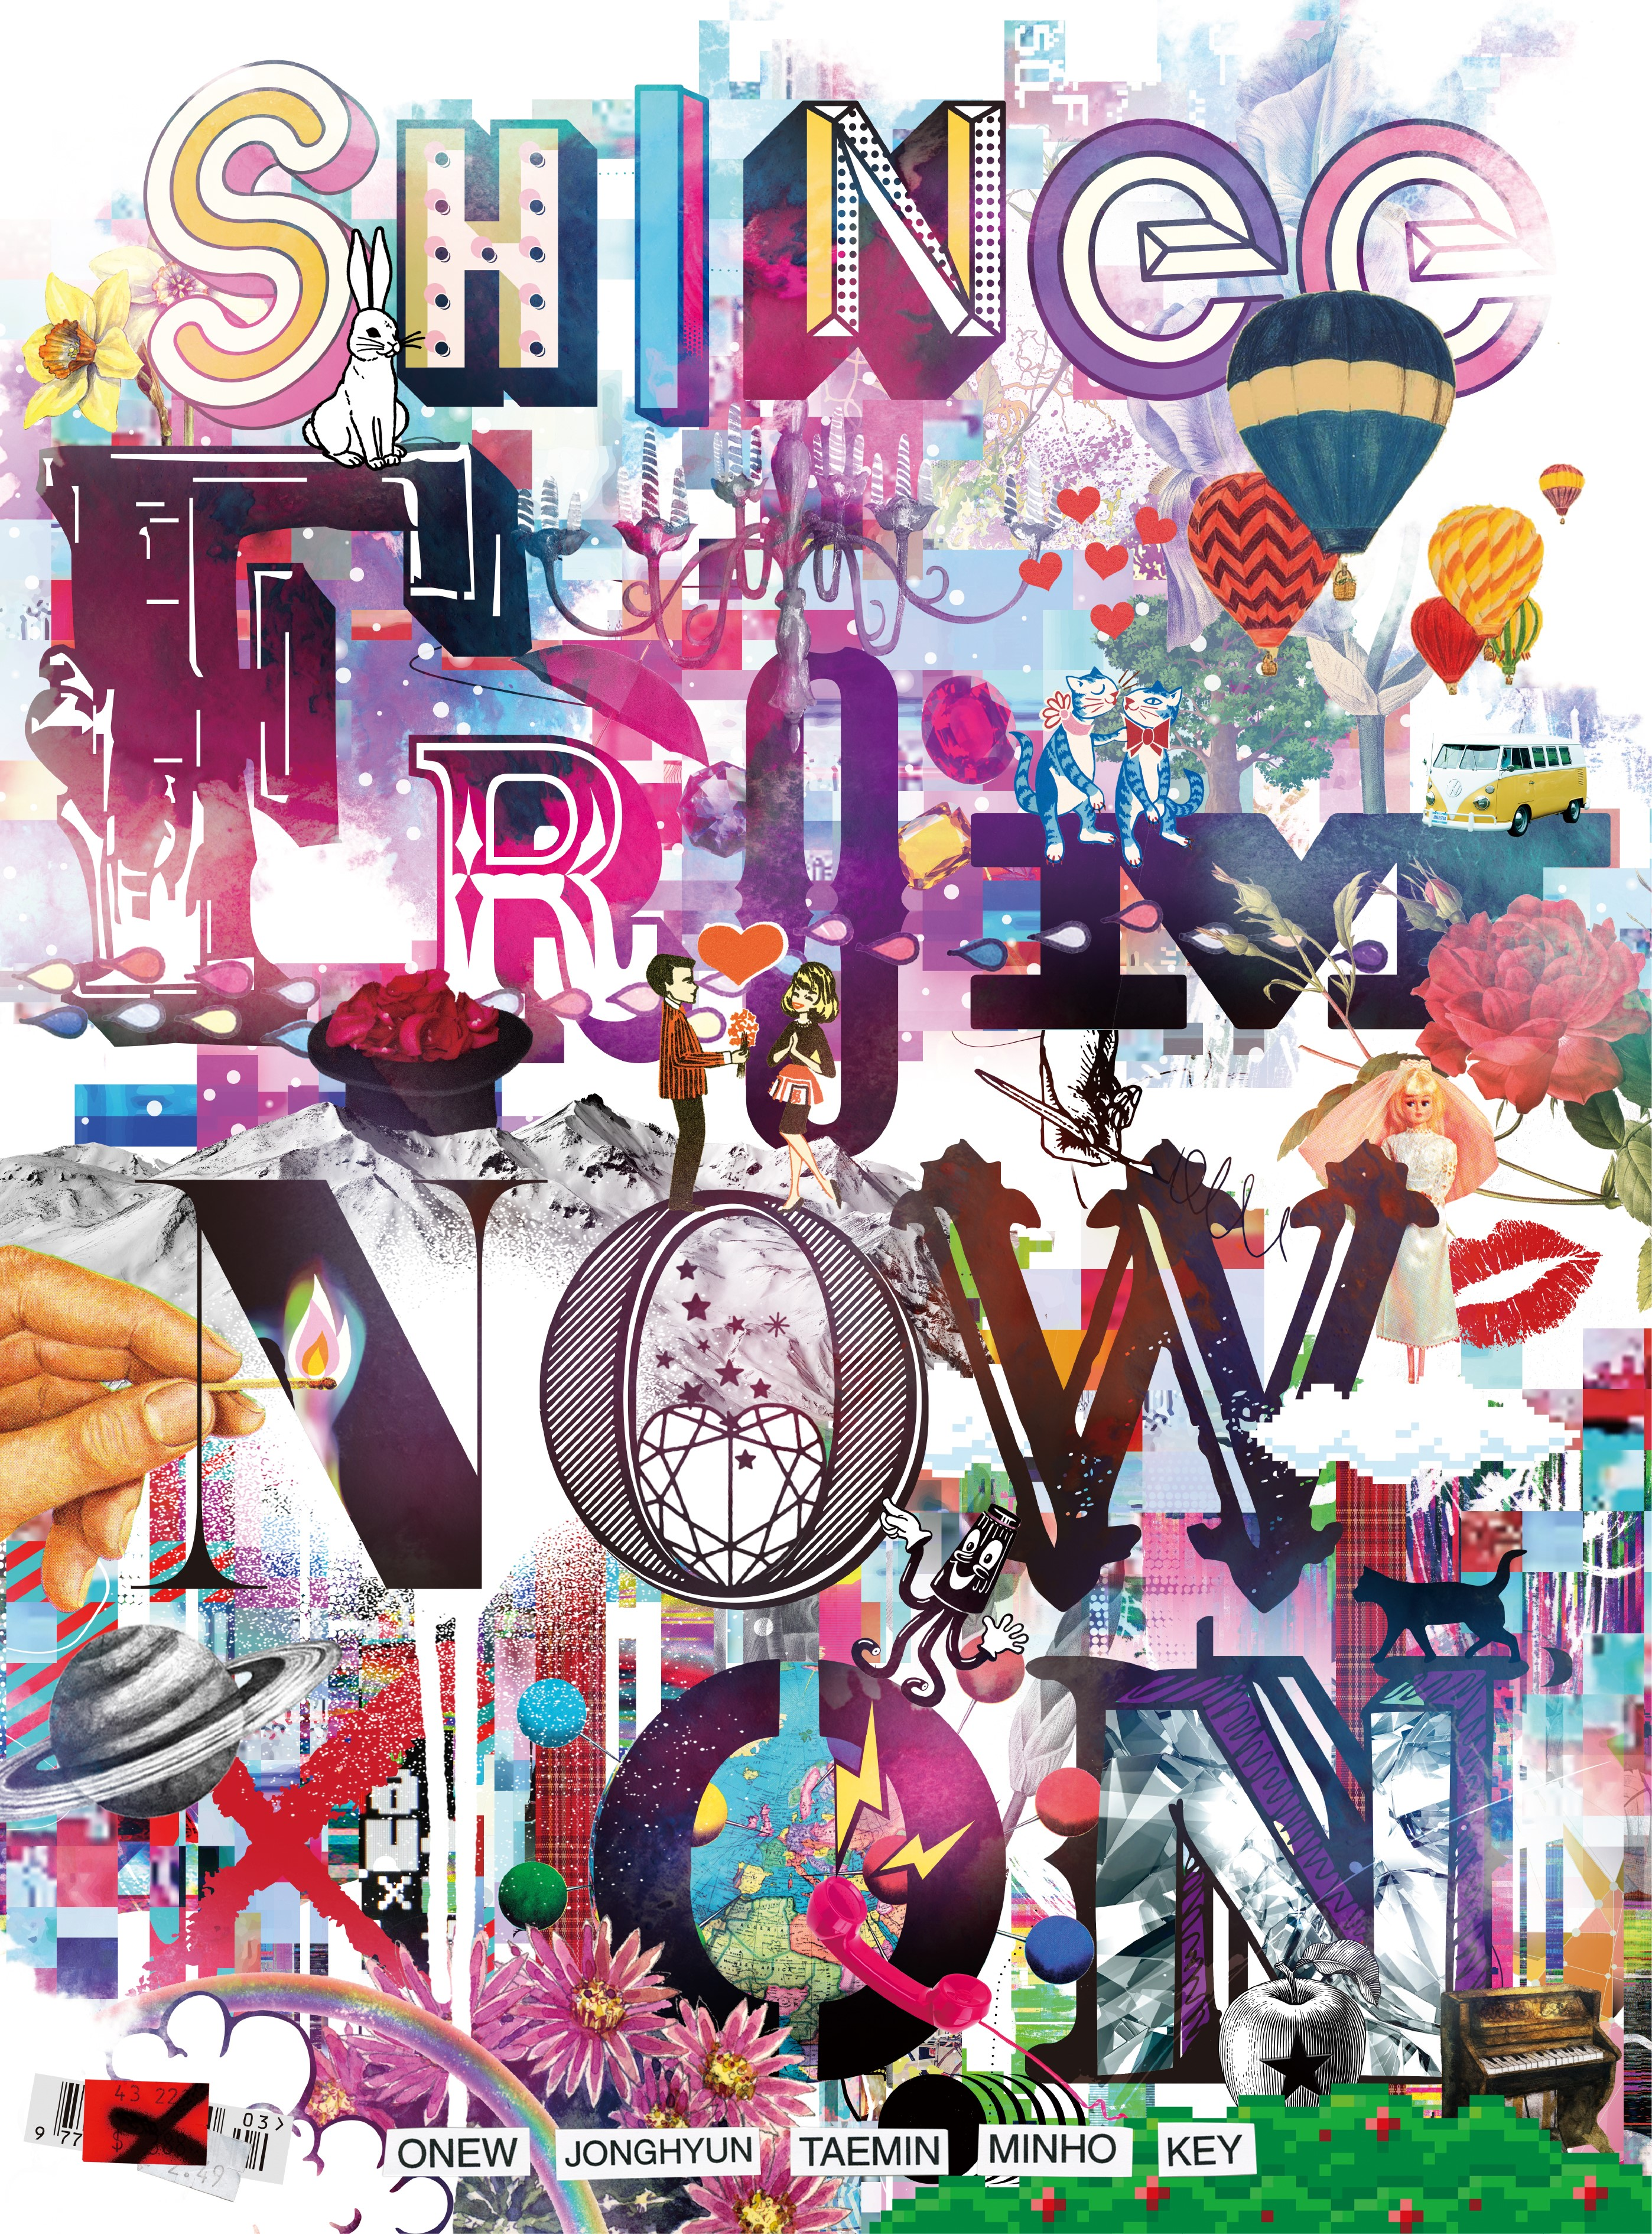 SHINee日本首张精选集连续两天登上Oricon日榜1位